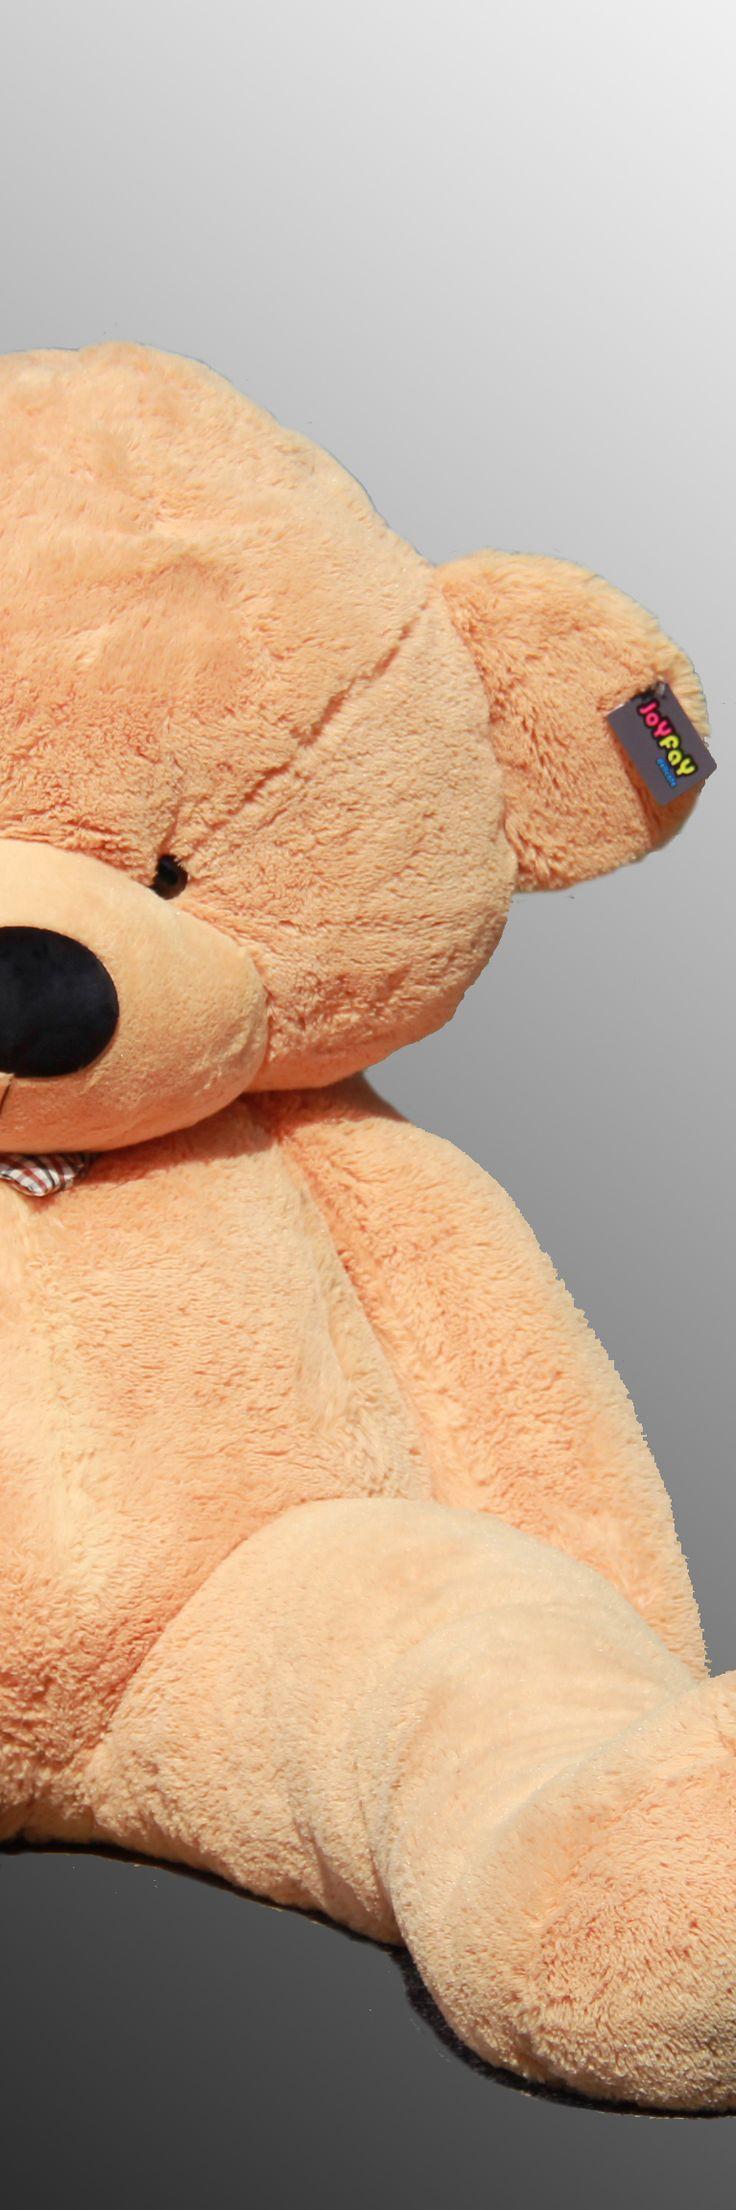 #Giant_Teddy_Bear  LINK:   http://www.joyfay.com/us/giant-huge-78-brown-teddy-bear-stuffed-plush-animal.html